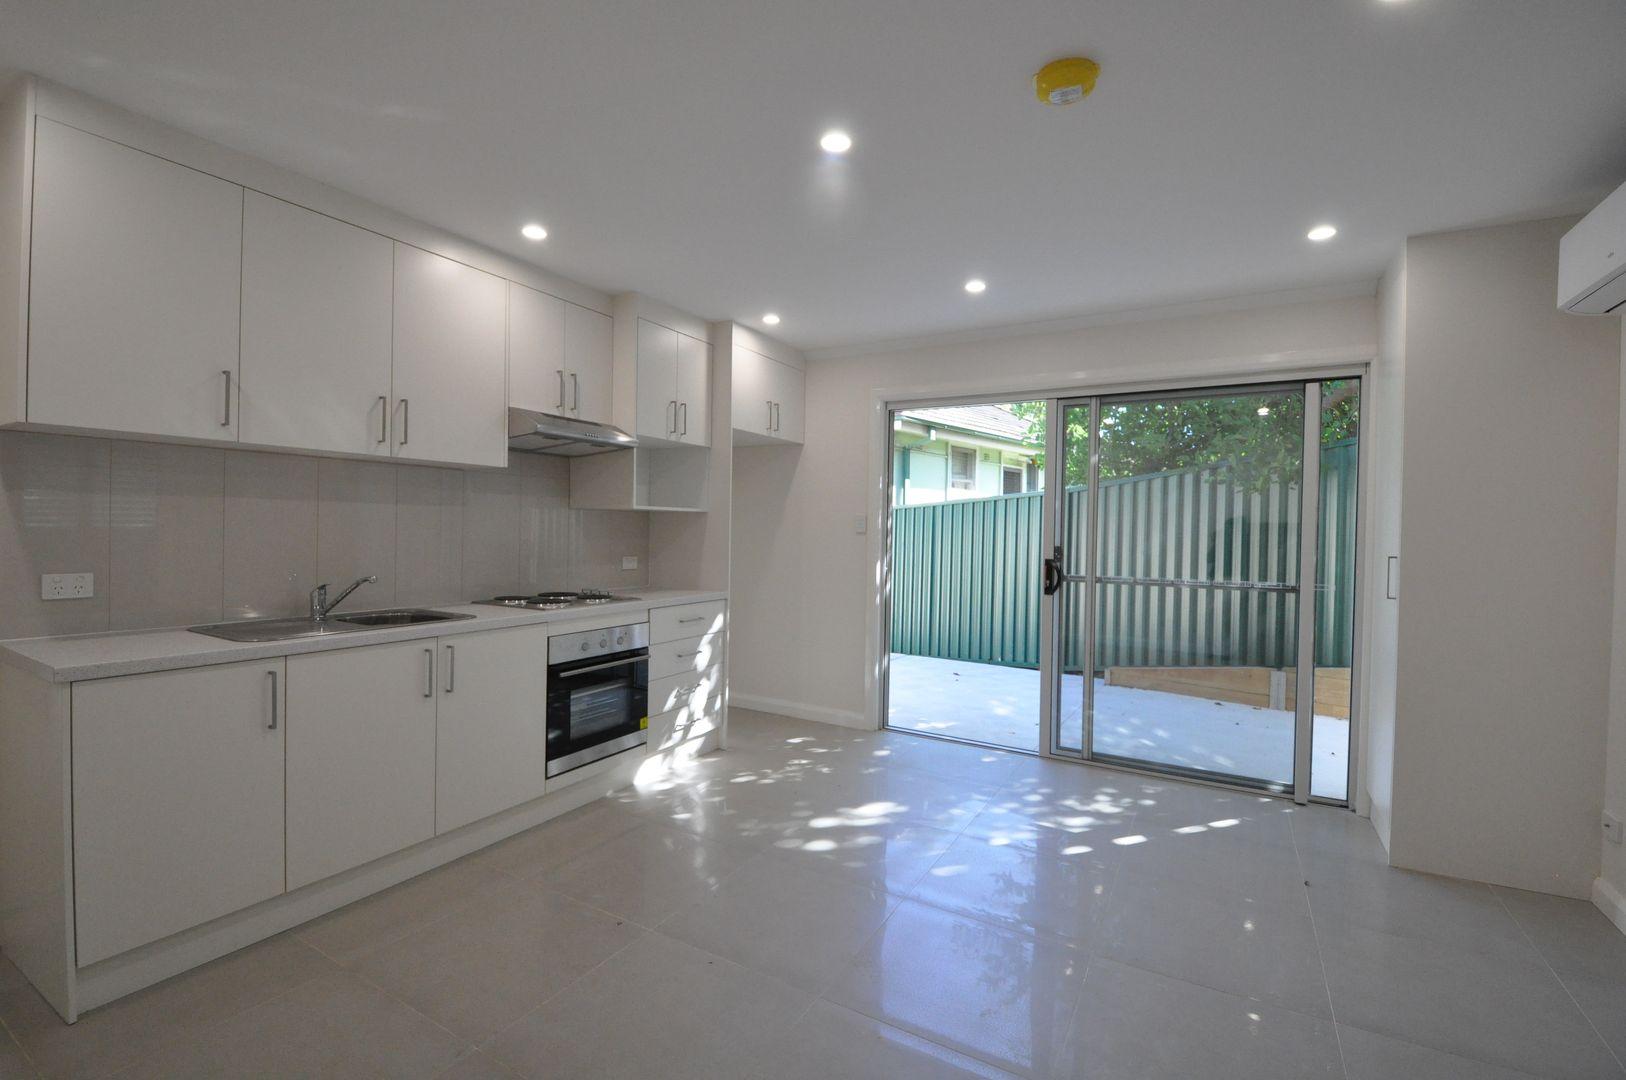 37A Sydney Joseph Drive, Seven Hills NSW 2147, Image 0